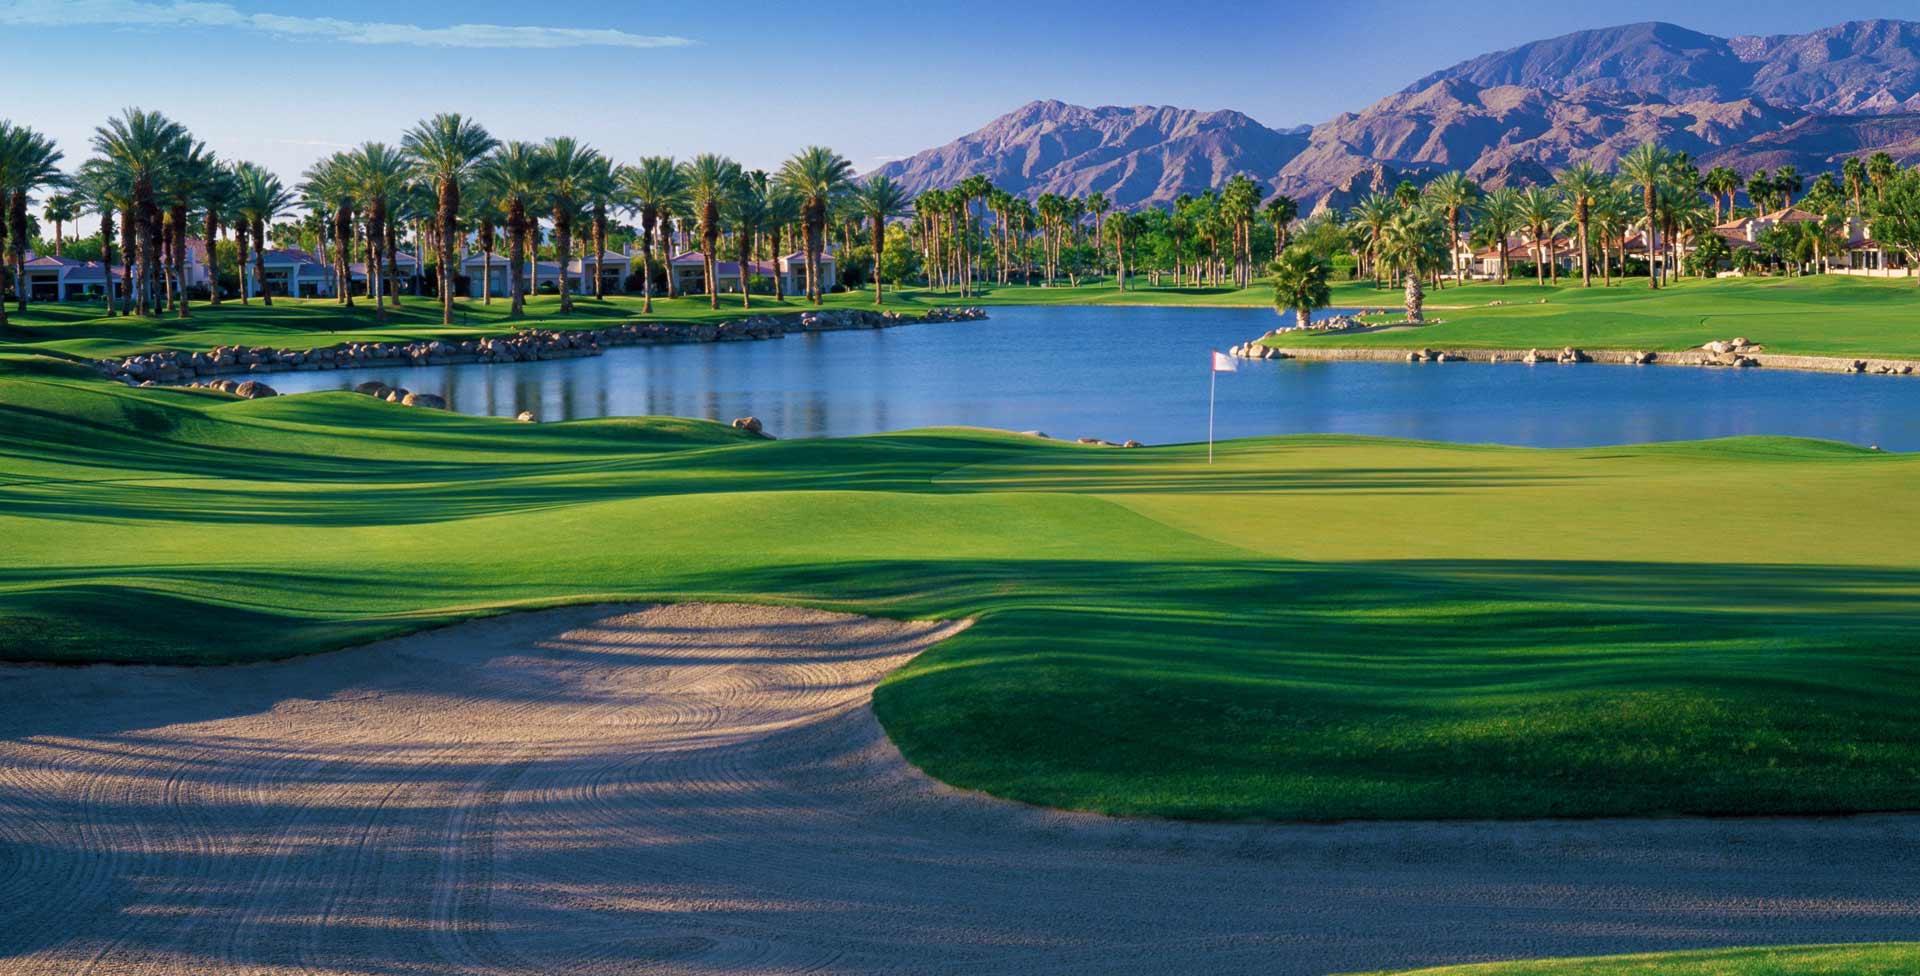 TPC Stadium Course at PGA West - GolfPunkHQ